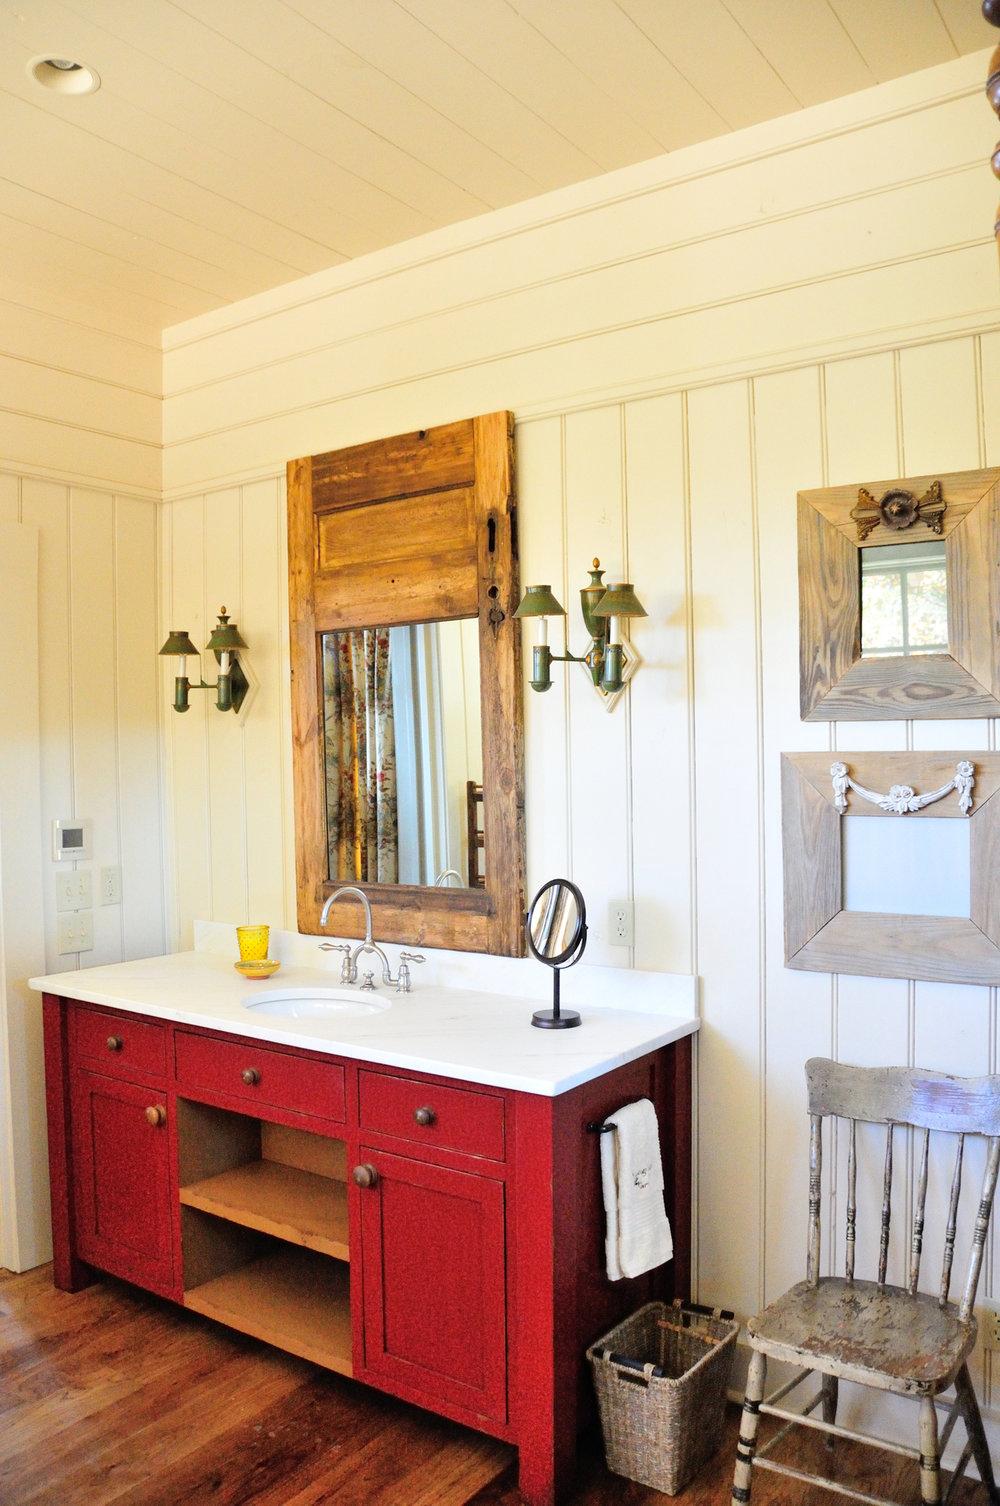 longridge_farm_lakehouse_03_lake_house_her_master_bathroom_bath_room_vanity_wood_panel_1300.jpg